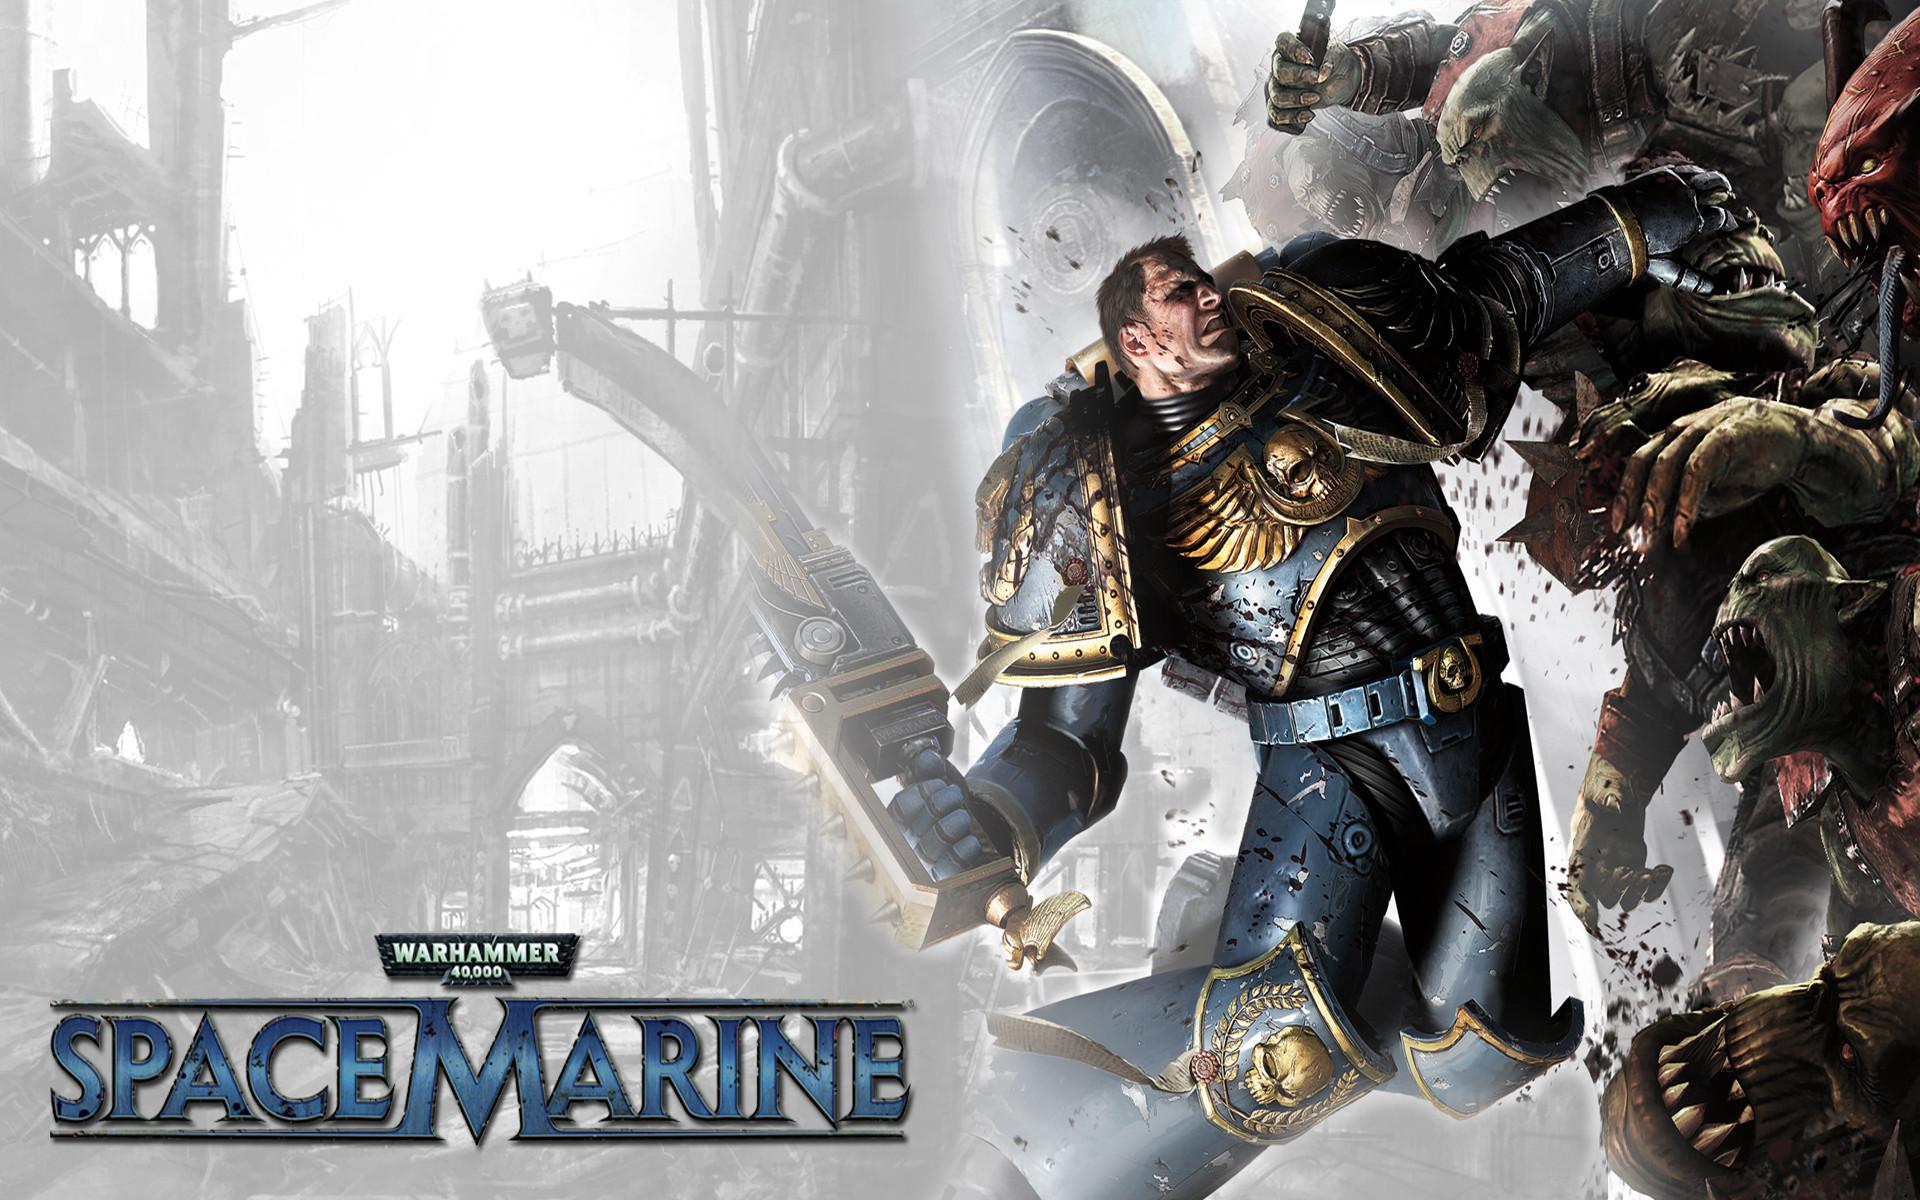 Video game Space marine